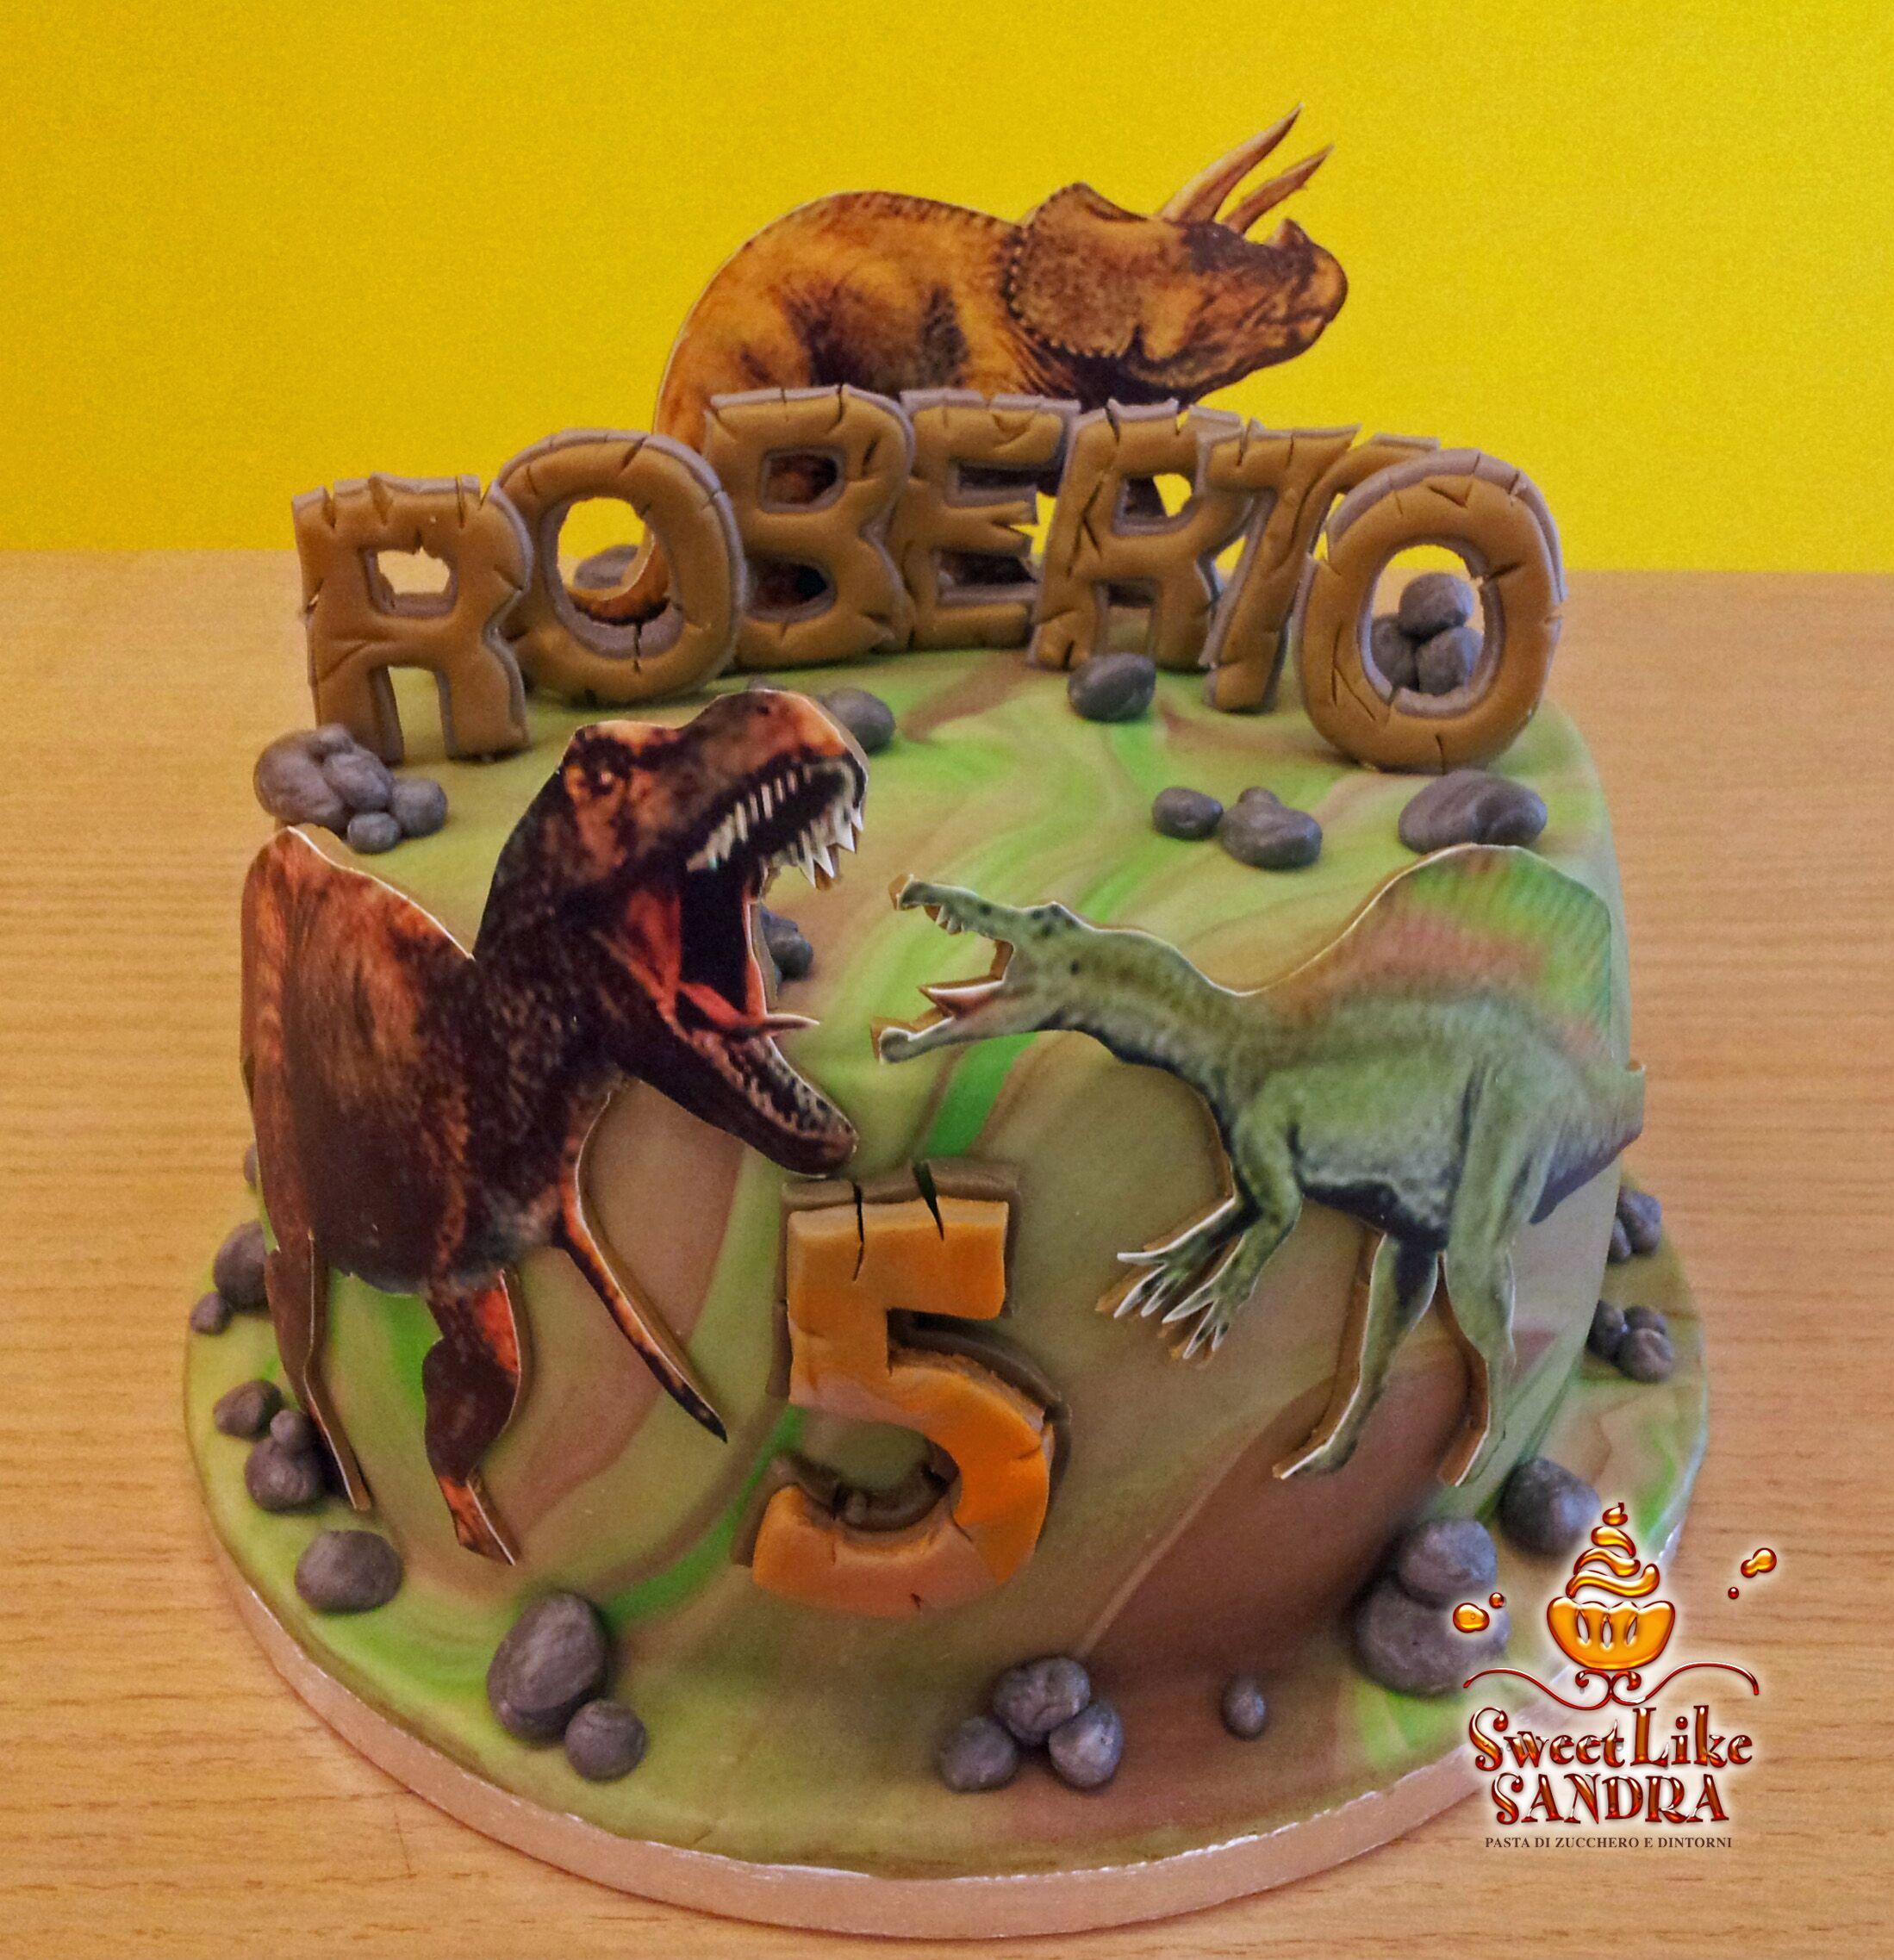 Torta Dinosauro - Dino's Cake